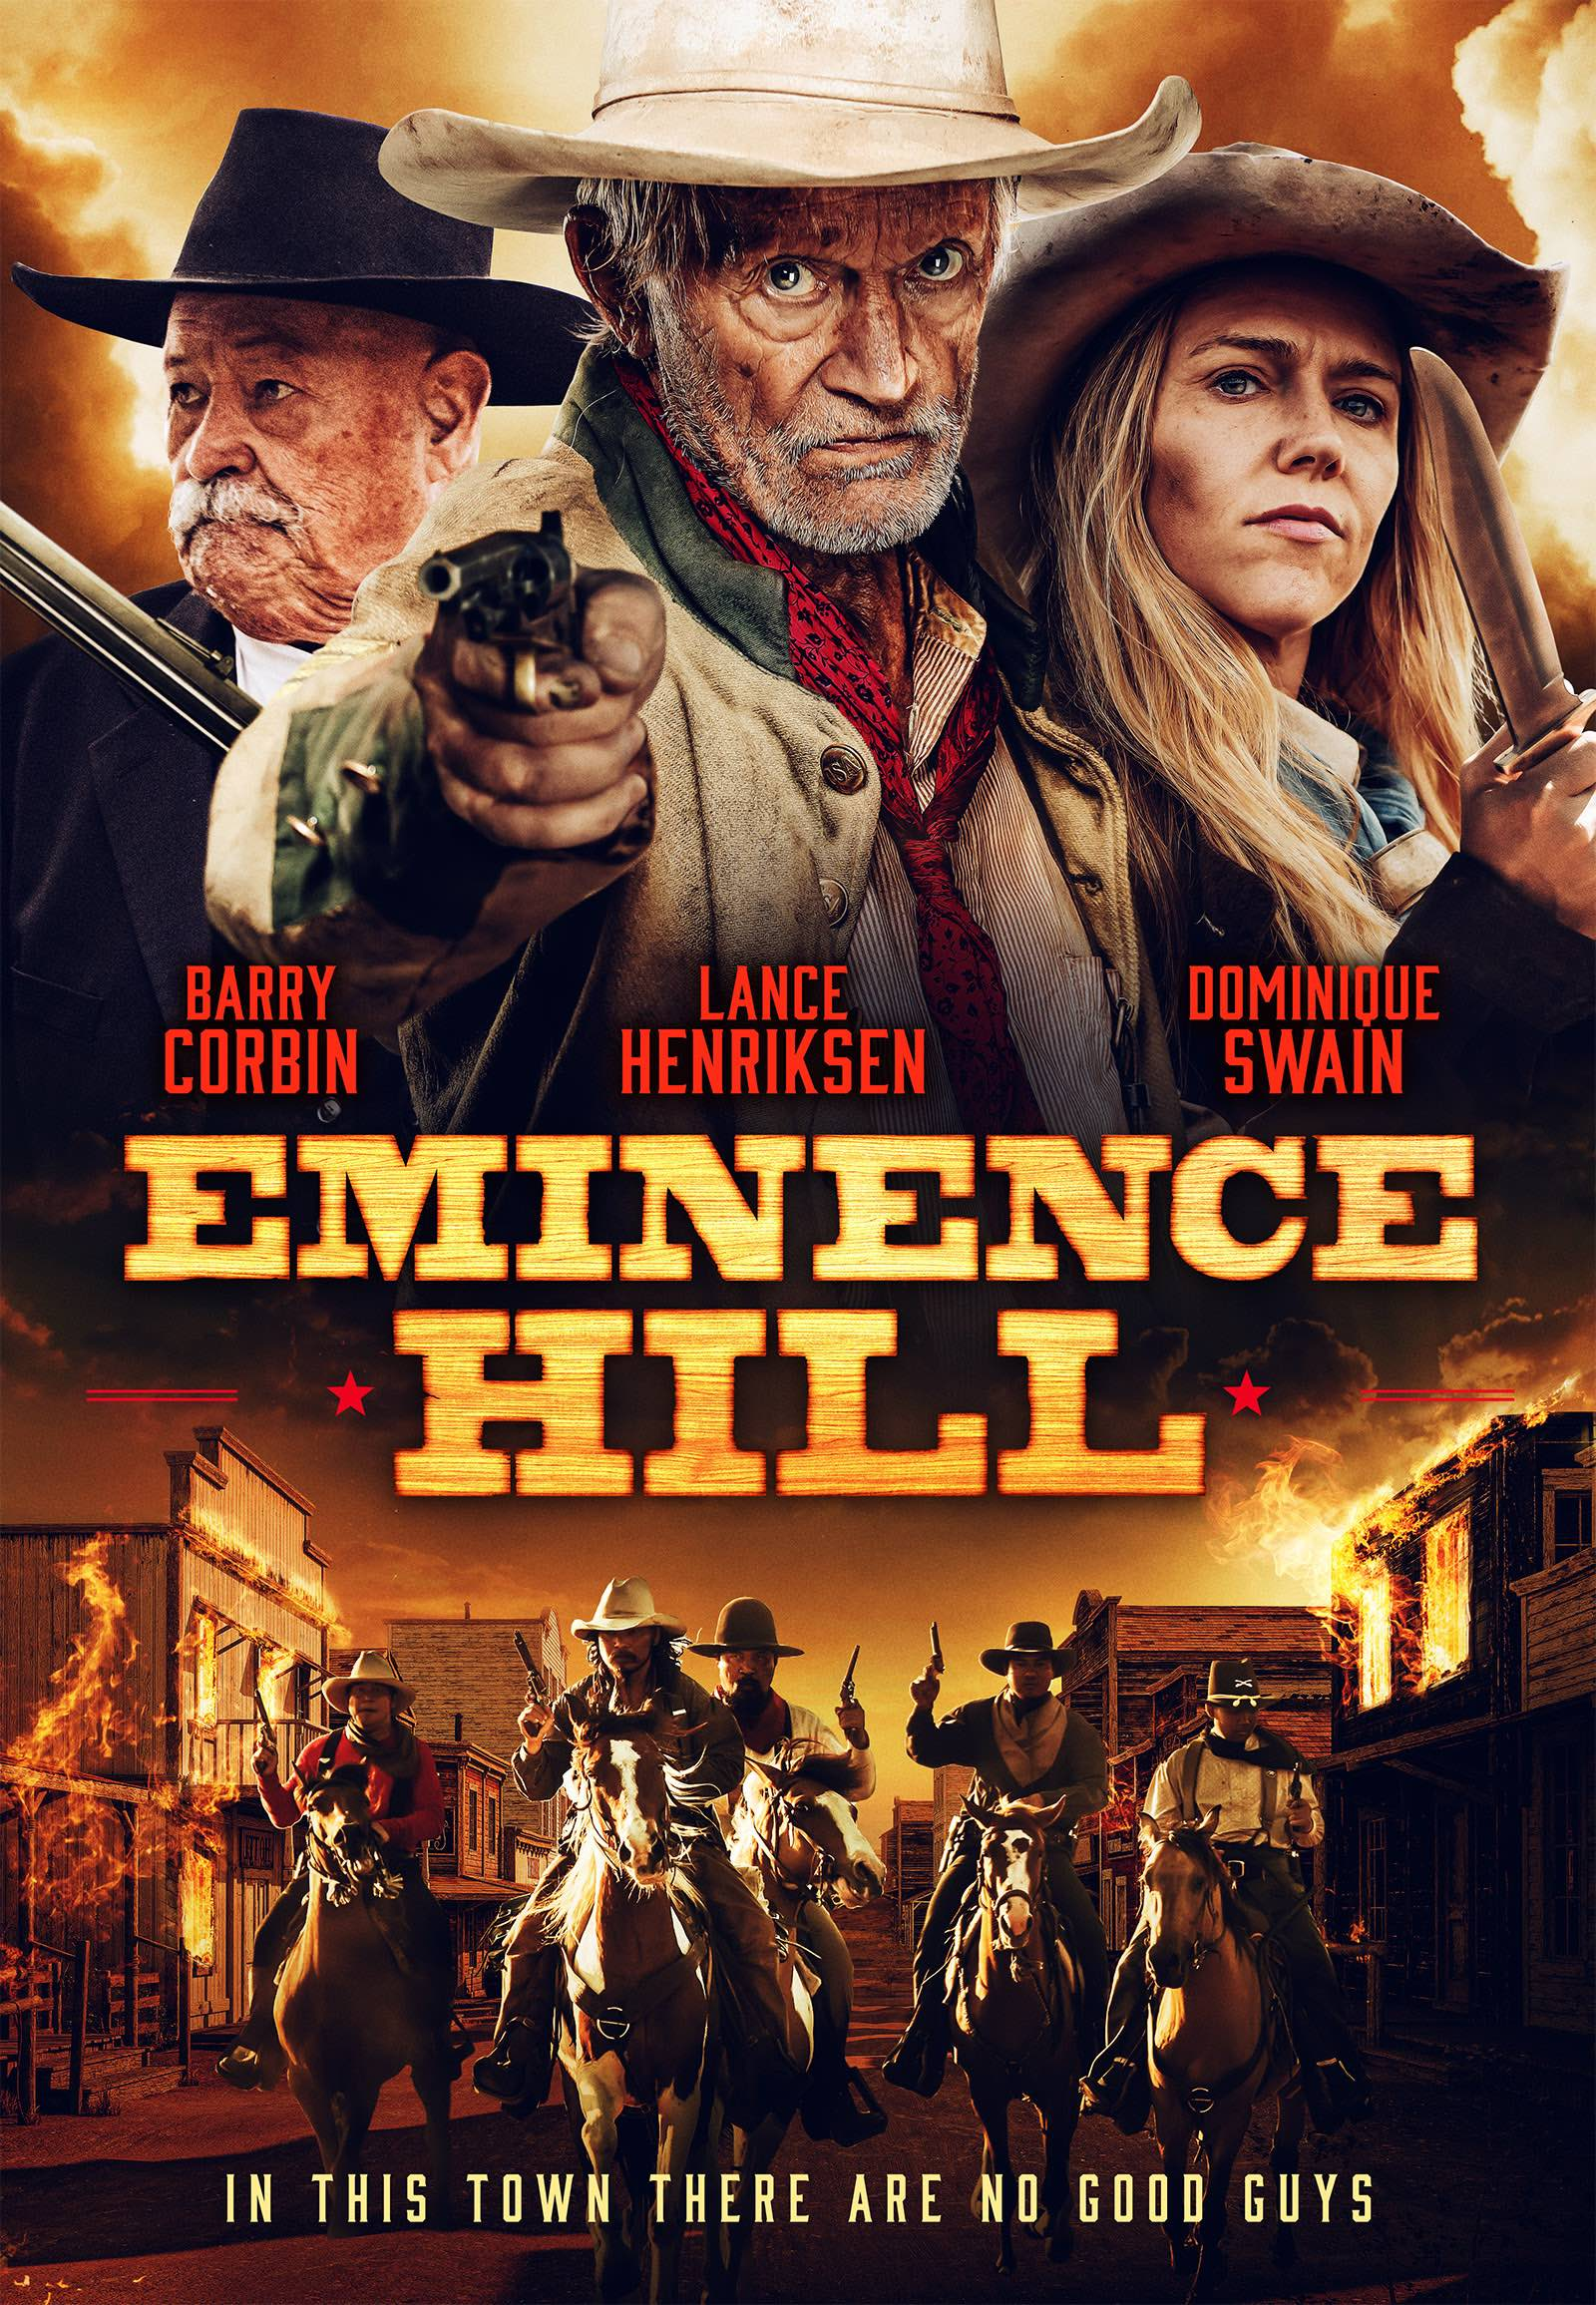 Eminence Hill, Dominique Swain